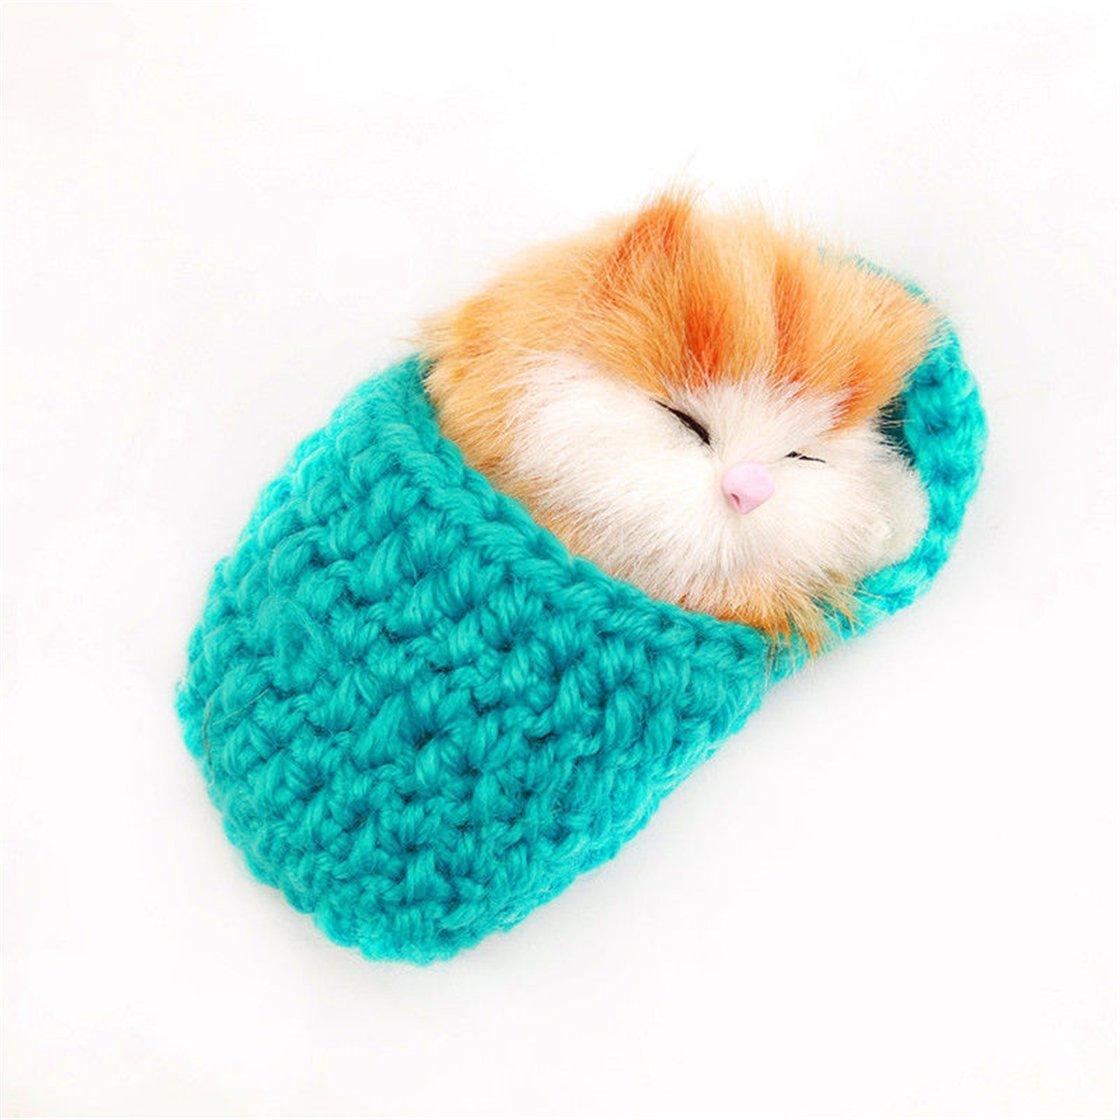 foreverstore Cute Shoe Kittens Cats Plush Kids Toys for Childrenクリスマスデコレーションギフト B072BMKC5L